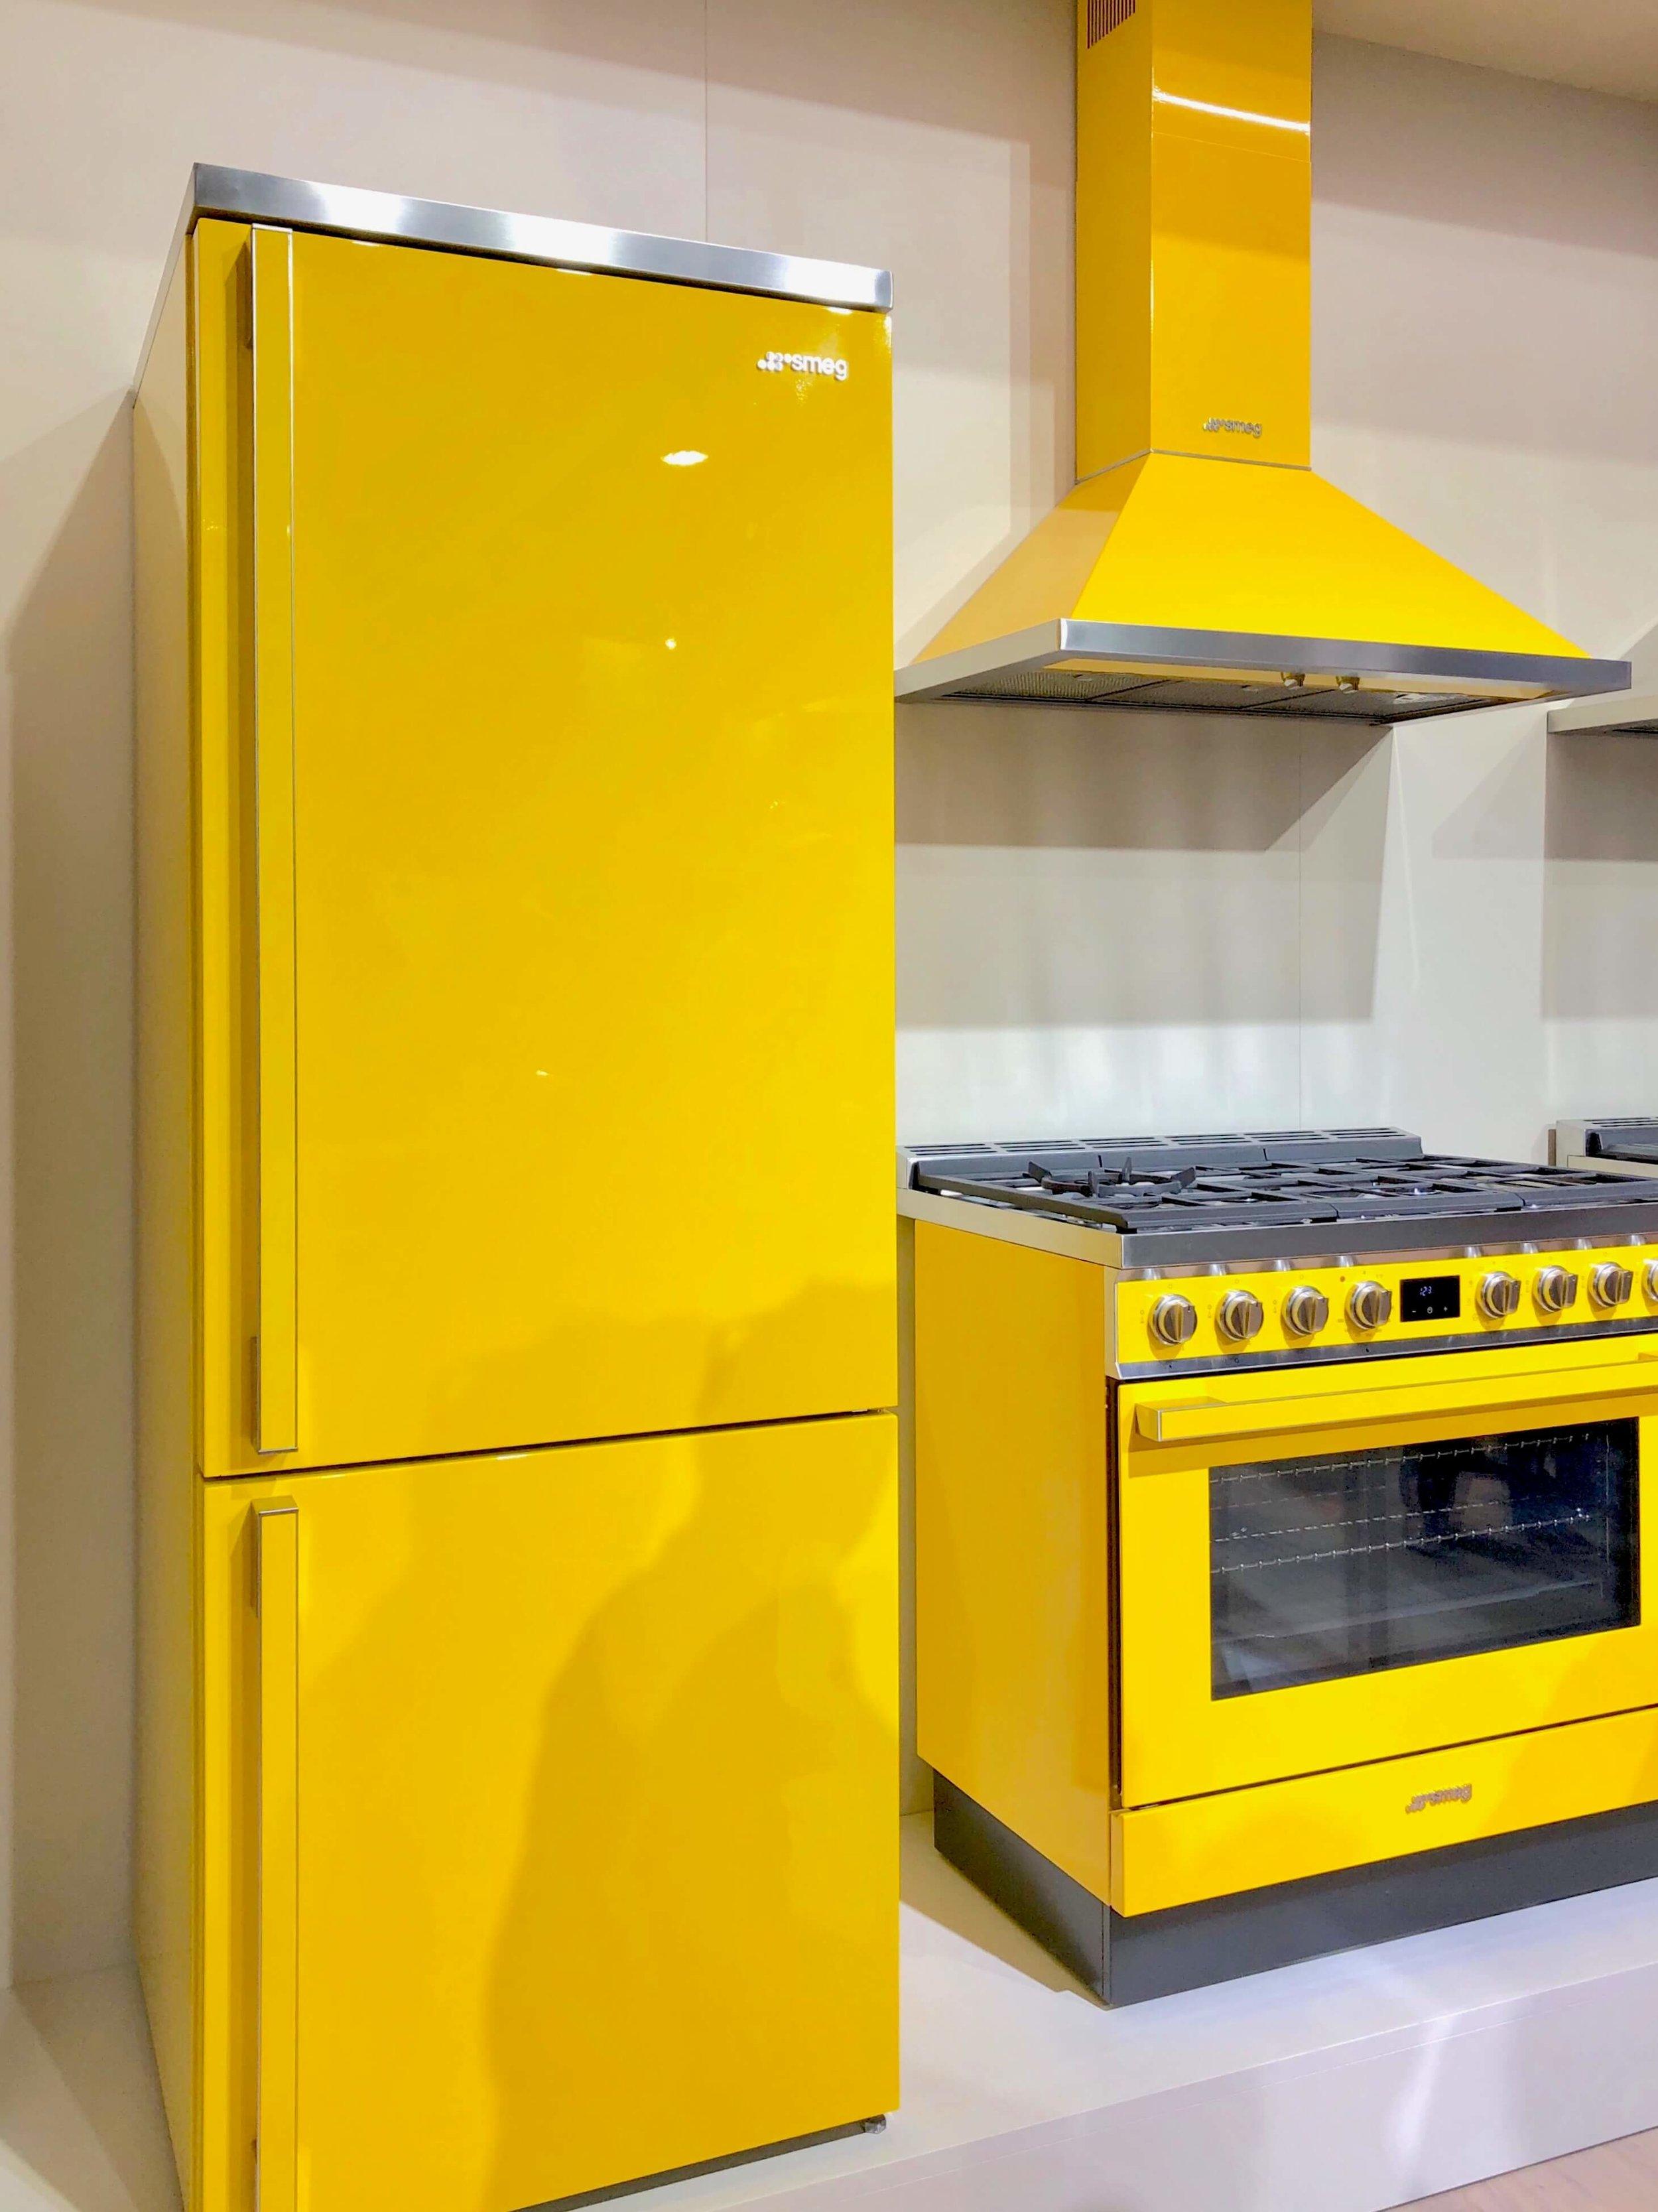 Colorful Smeg Appliances   KBIS 2019